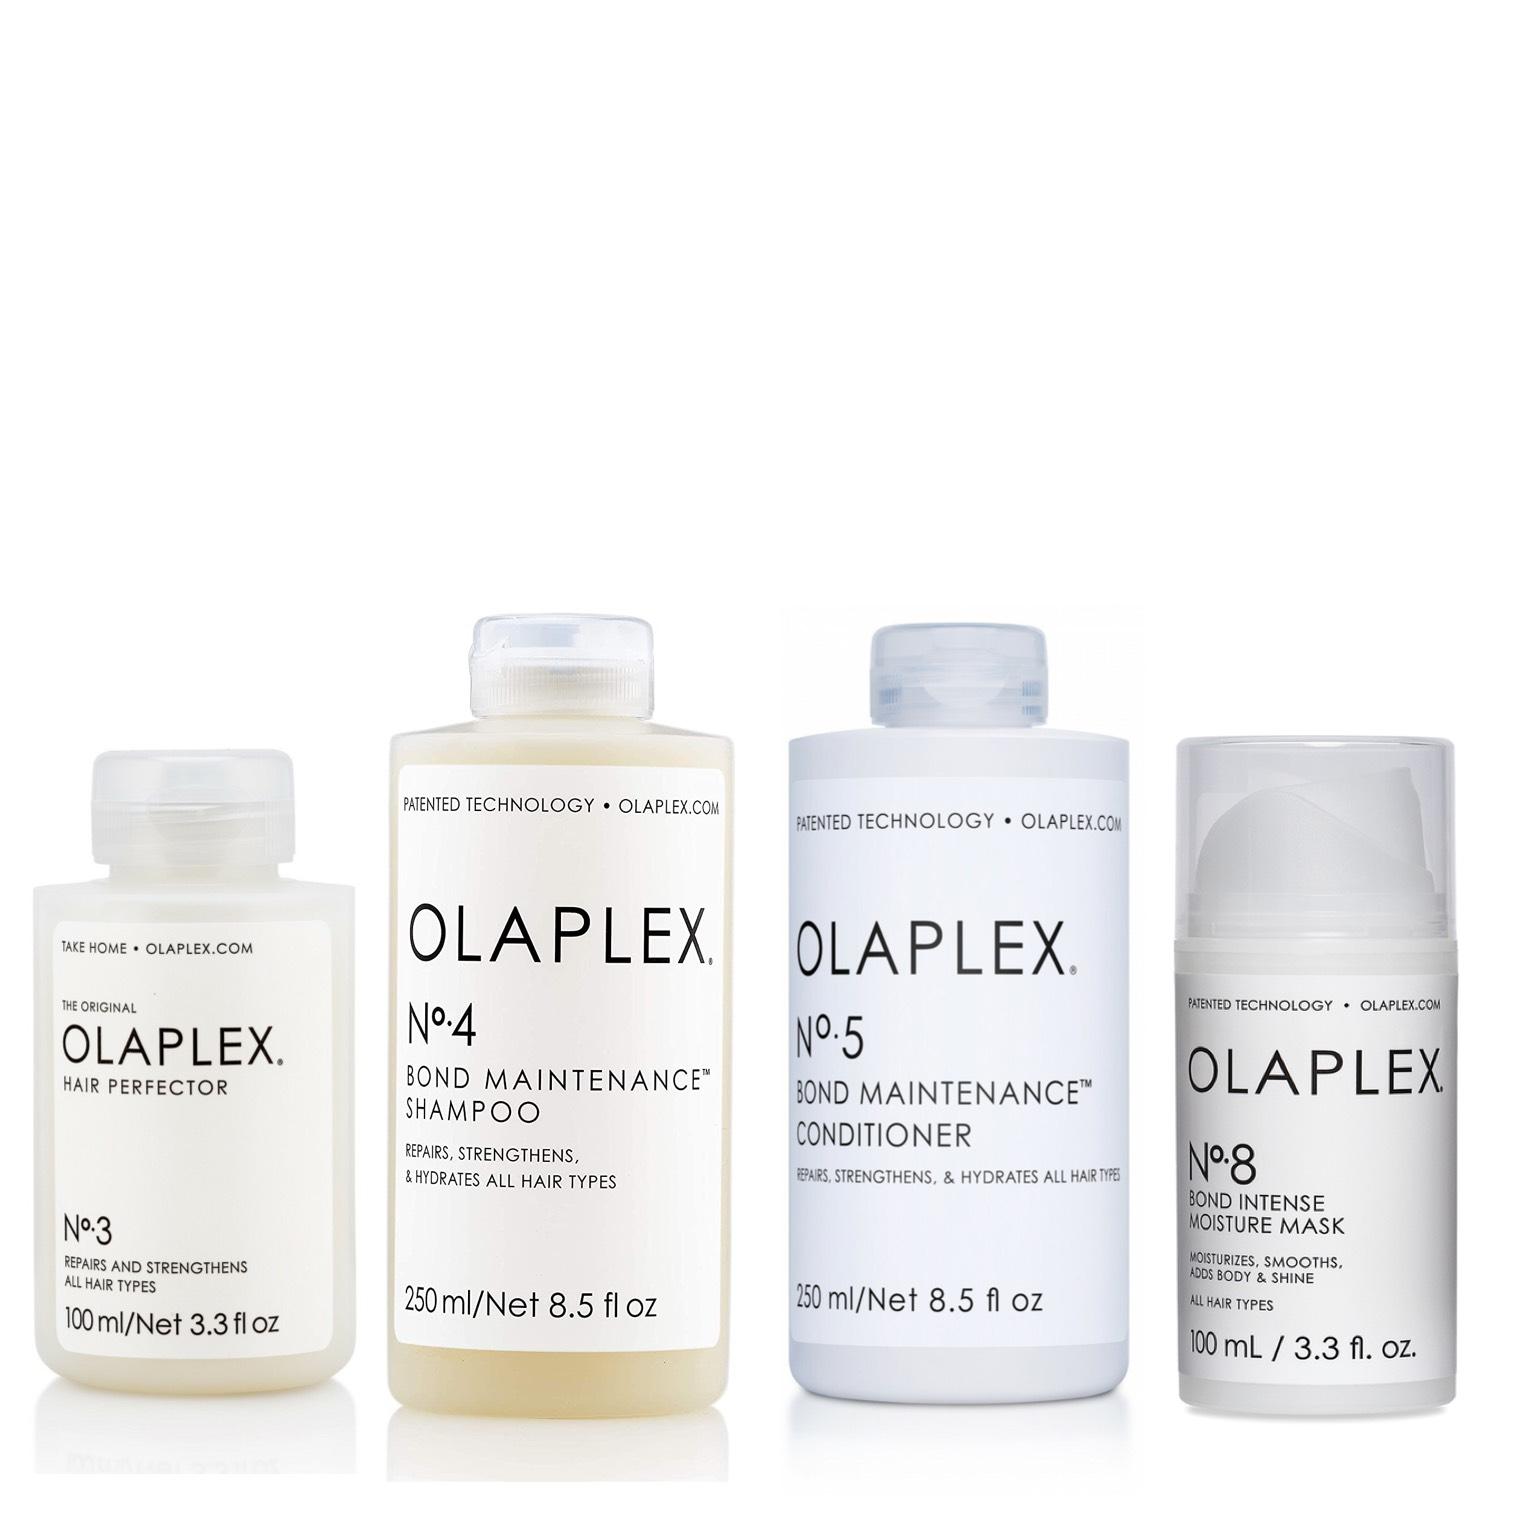 Olaplex Set - Olaplex No 3 Hair Perfector 100ml + Olaplex No 4 Bond Maintenance Shampoo 250ml + Olaplex No 5 Bond Maintenance Conditioner 250ml + Olaplex No 8 Bond Intense Moisture Mask 100ml